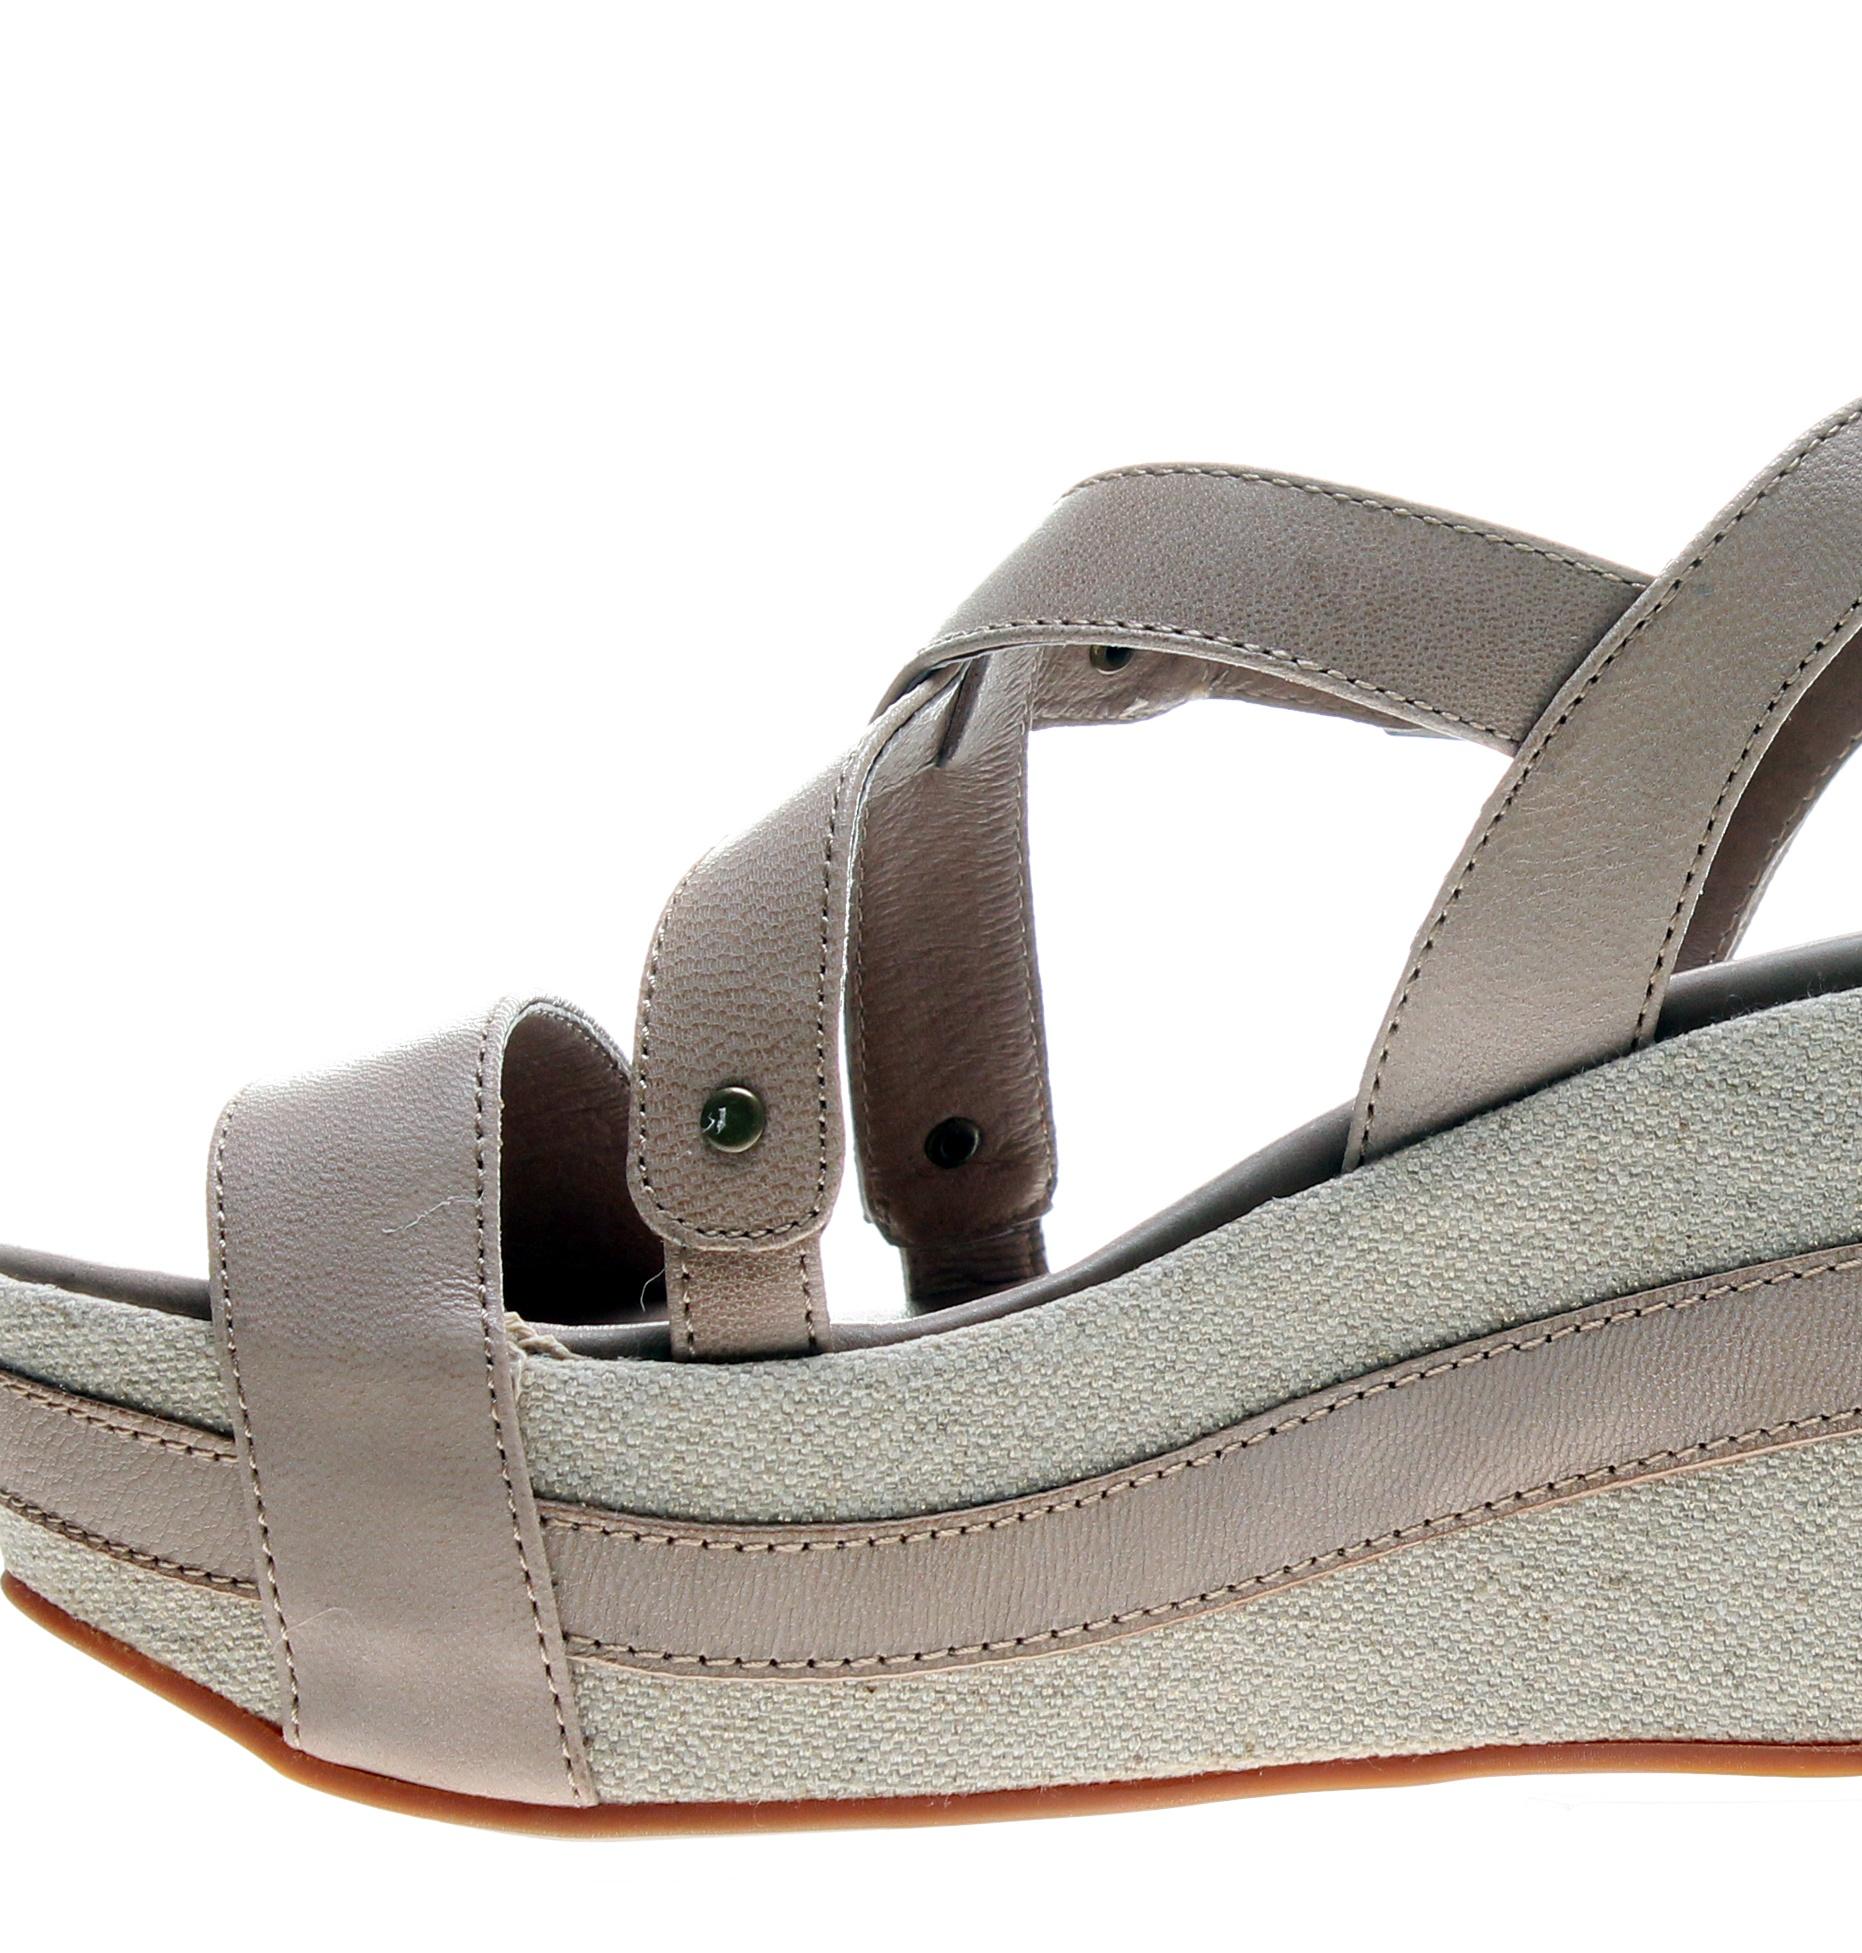 Antelope 821 Slingback Makeup Women's Wedge Sandals 821-MAKEUP